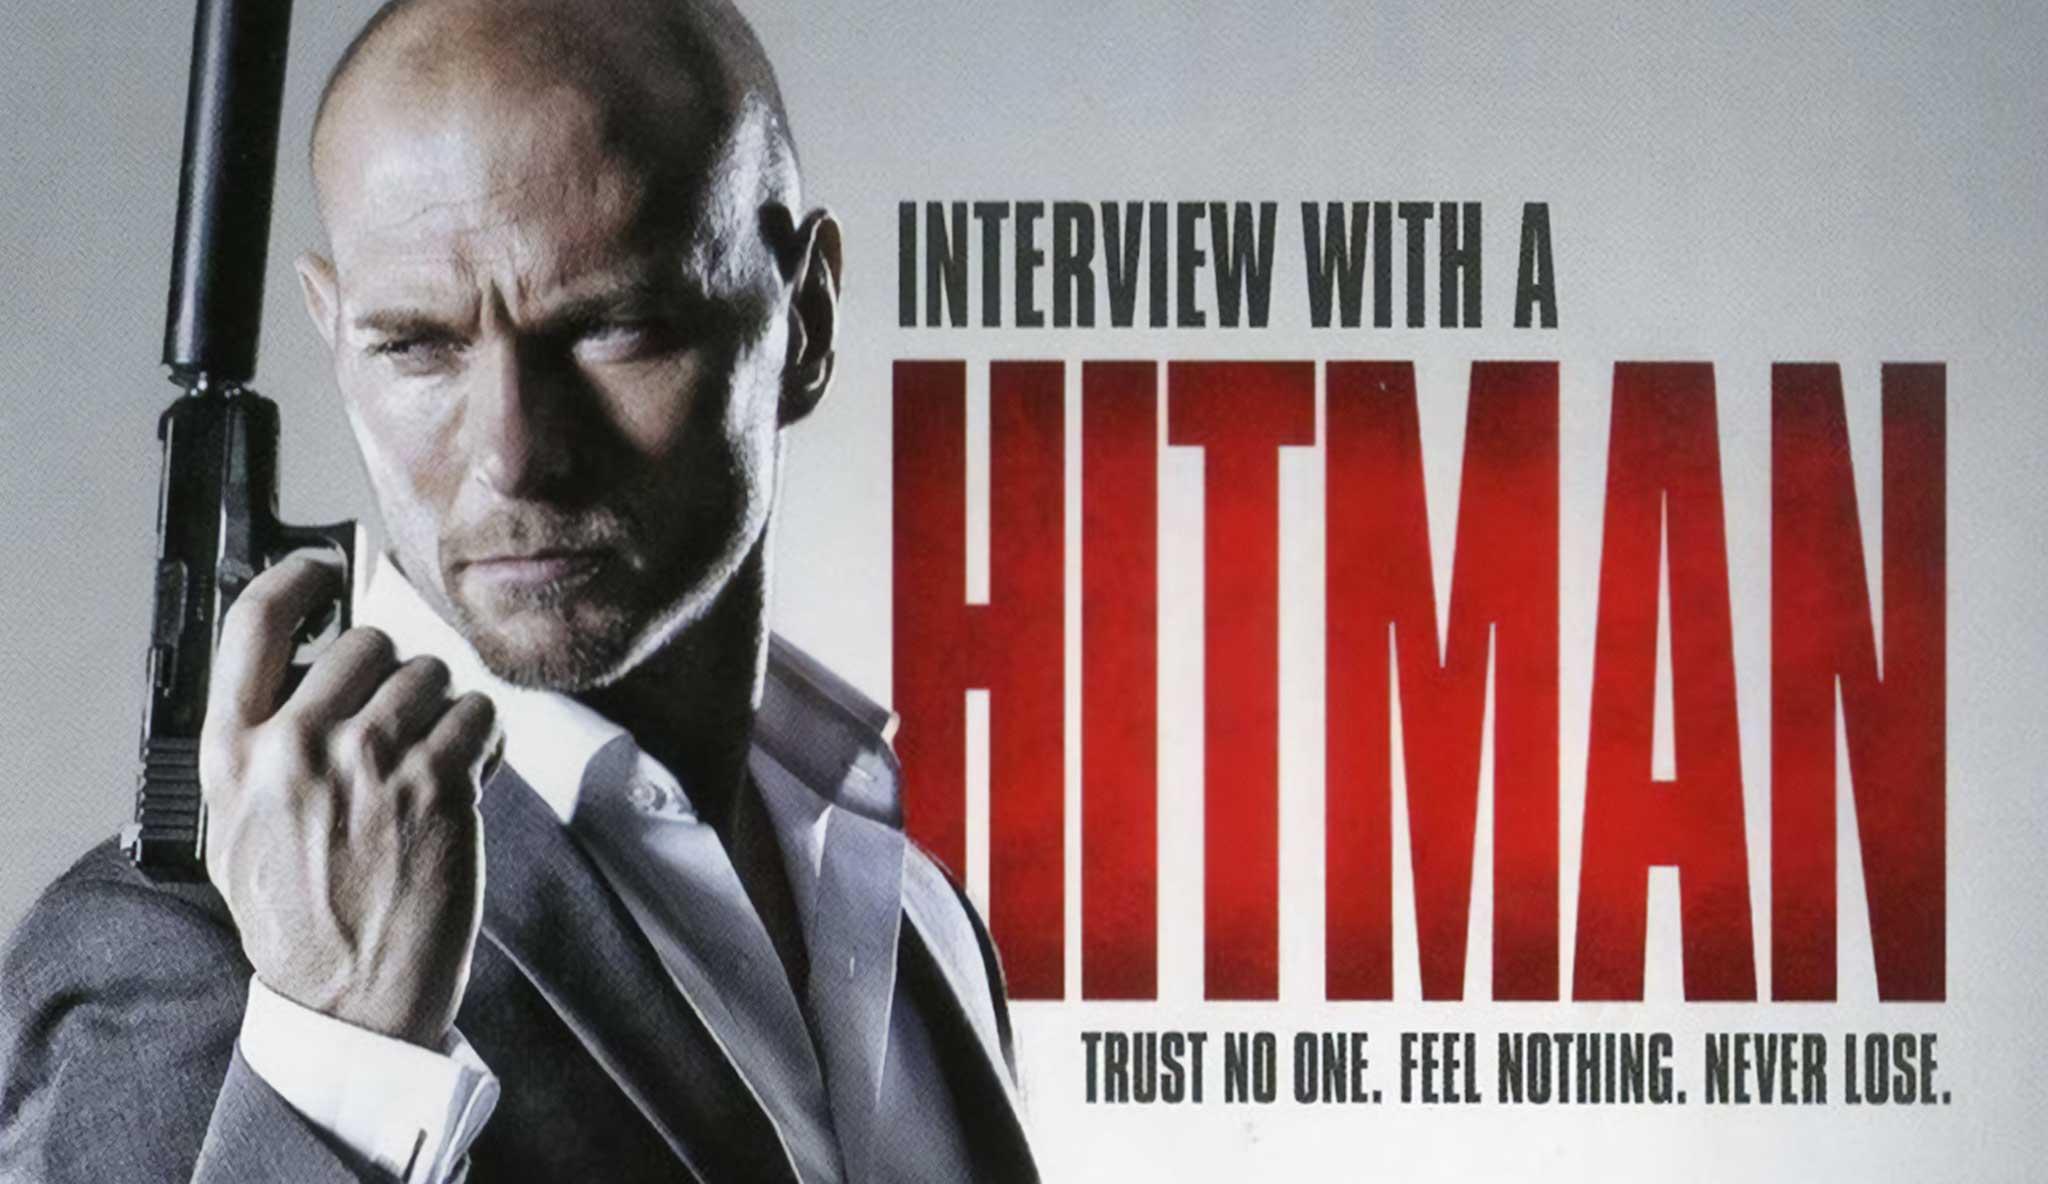 interview-with-a-hitman\header.jpg